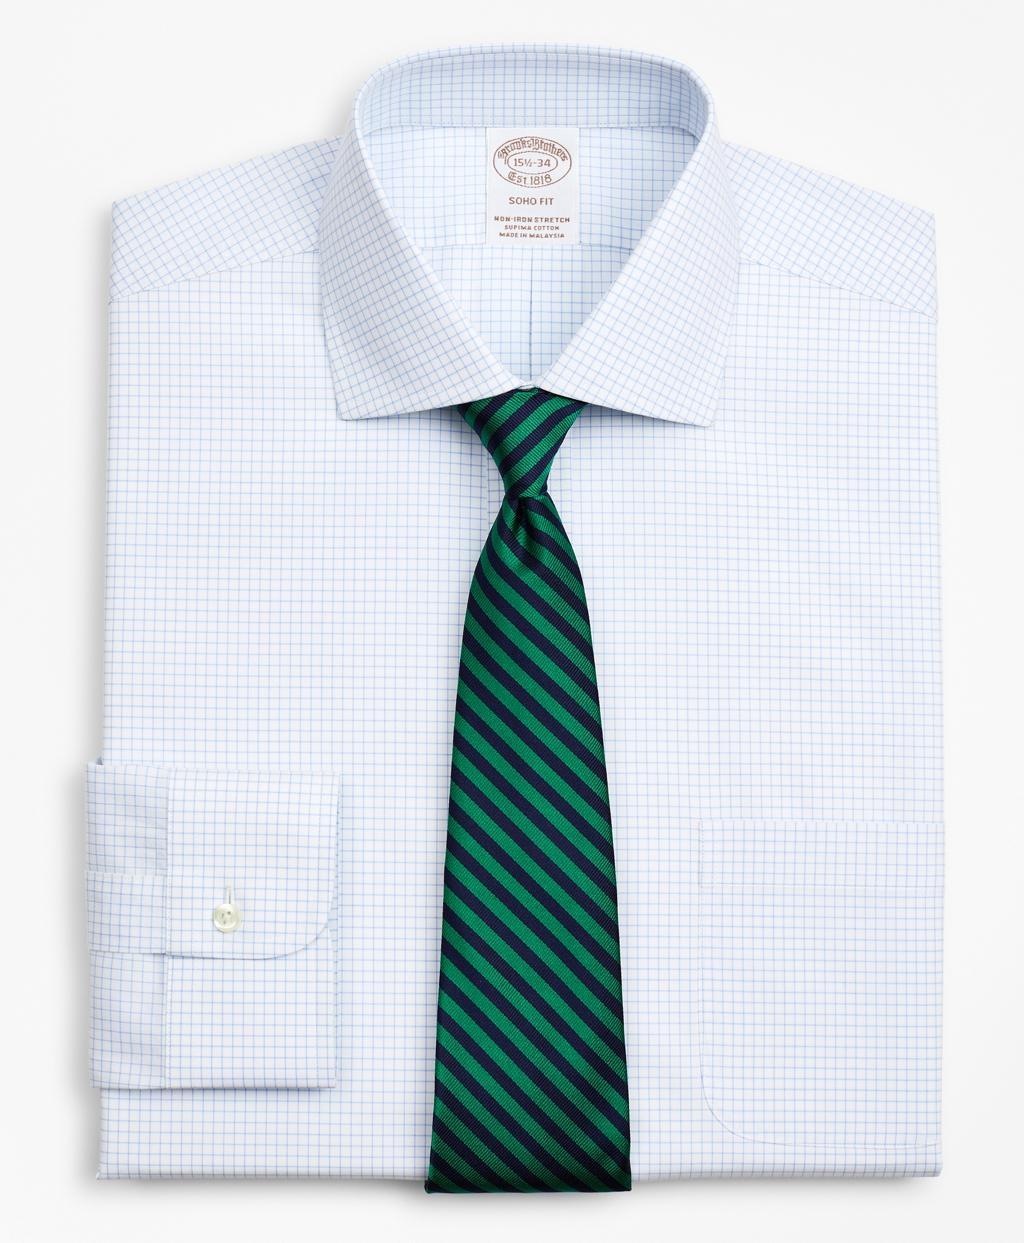 Brooksbrothers Stretch Soho Extra-Slim-Fit Dress Shirt, Non-Iron Poplin English Collar Small Grid Check